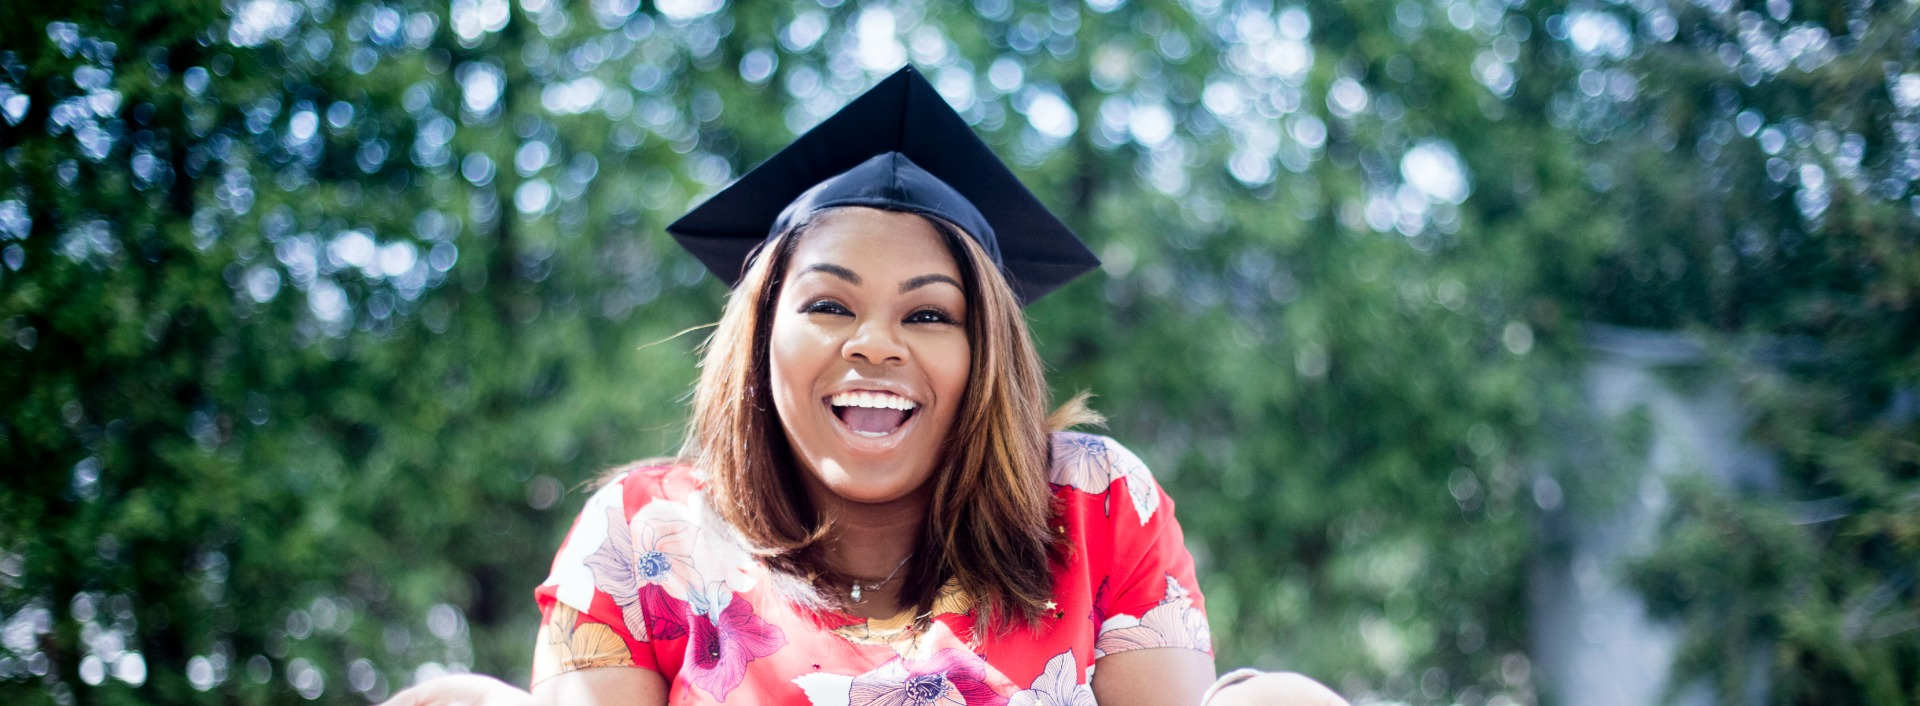 A smiling woman wears a graduation cap after writing an effective university motivation letter.